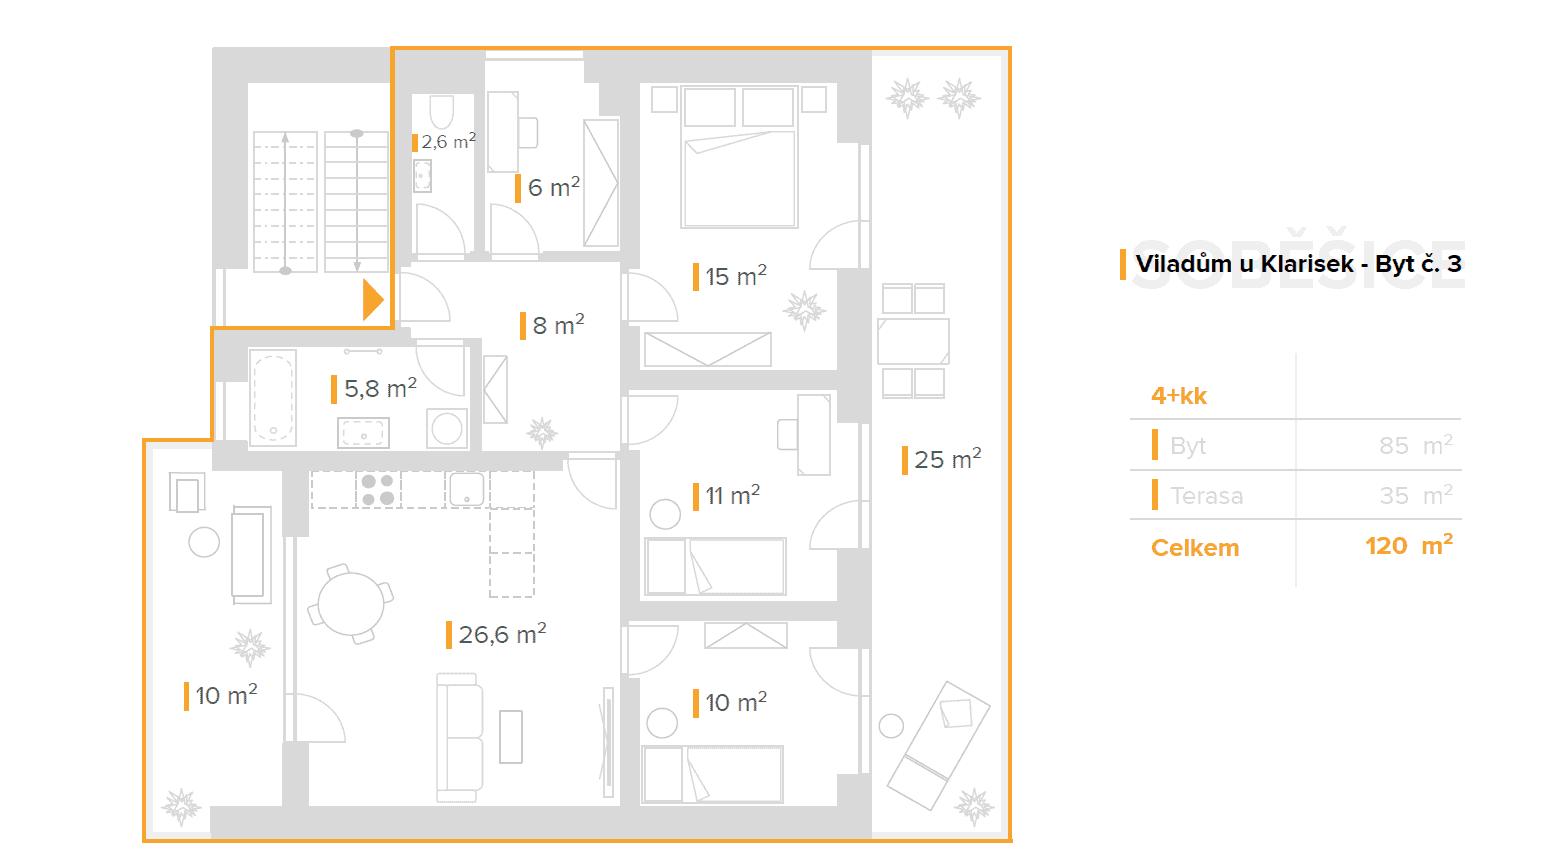 4+kk – Viladům u Klarisek (3)